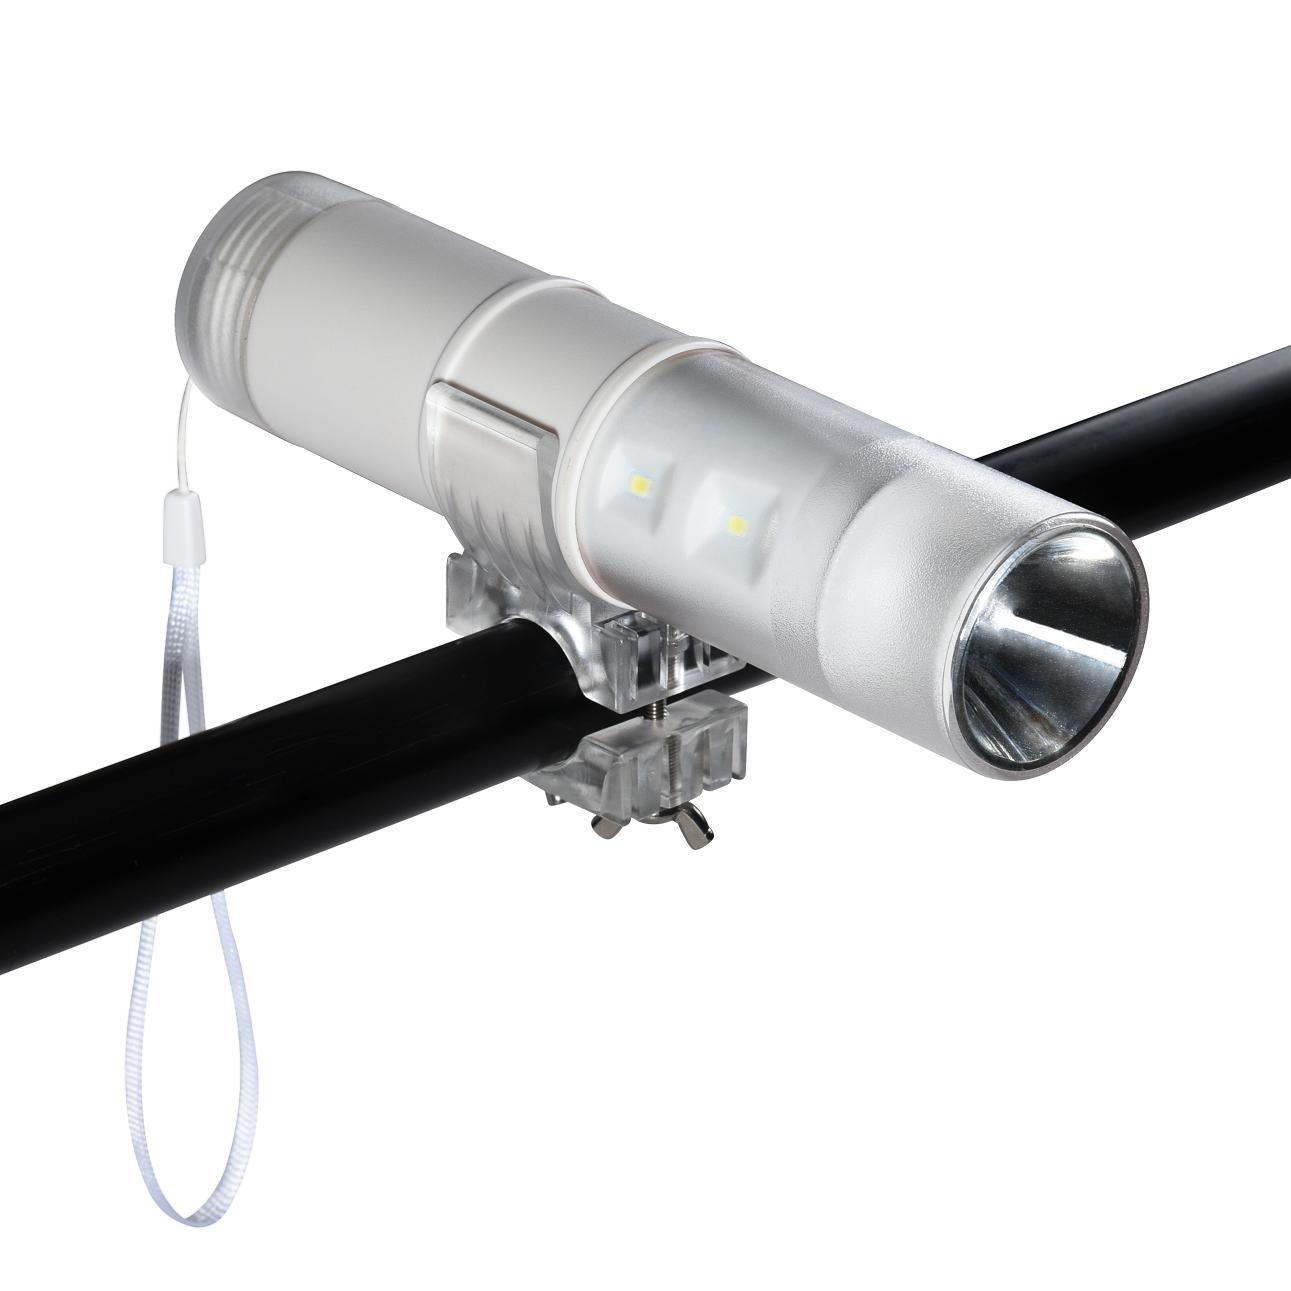 China factory new version 3.7V/4000mAh led flashlight torches